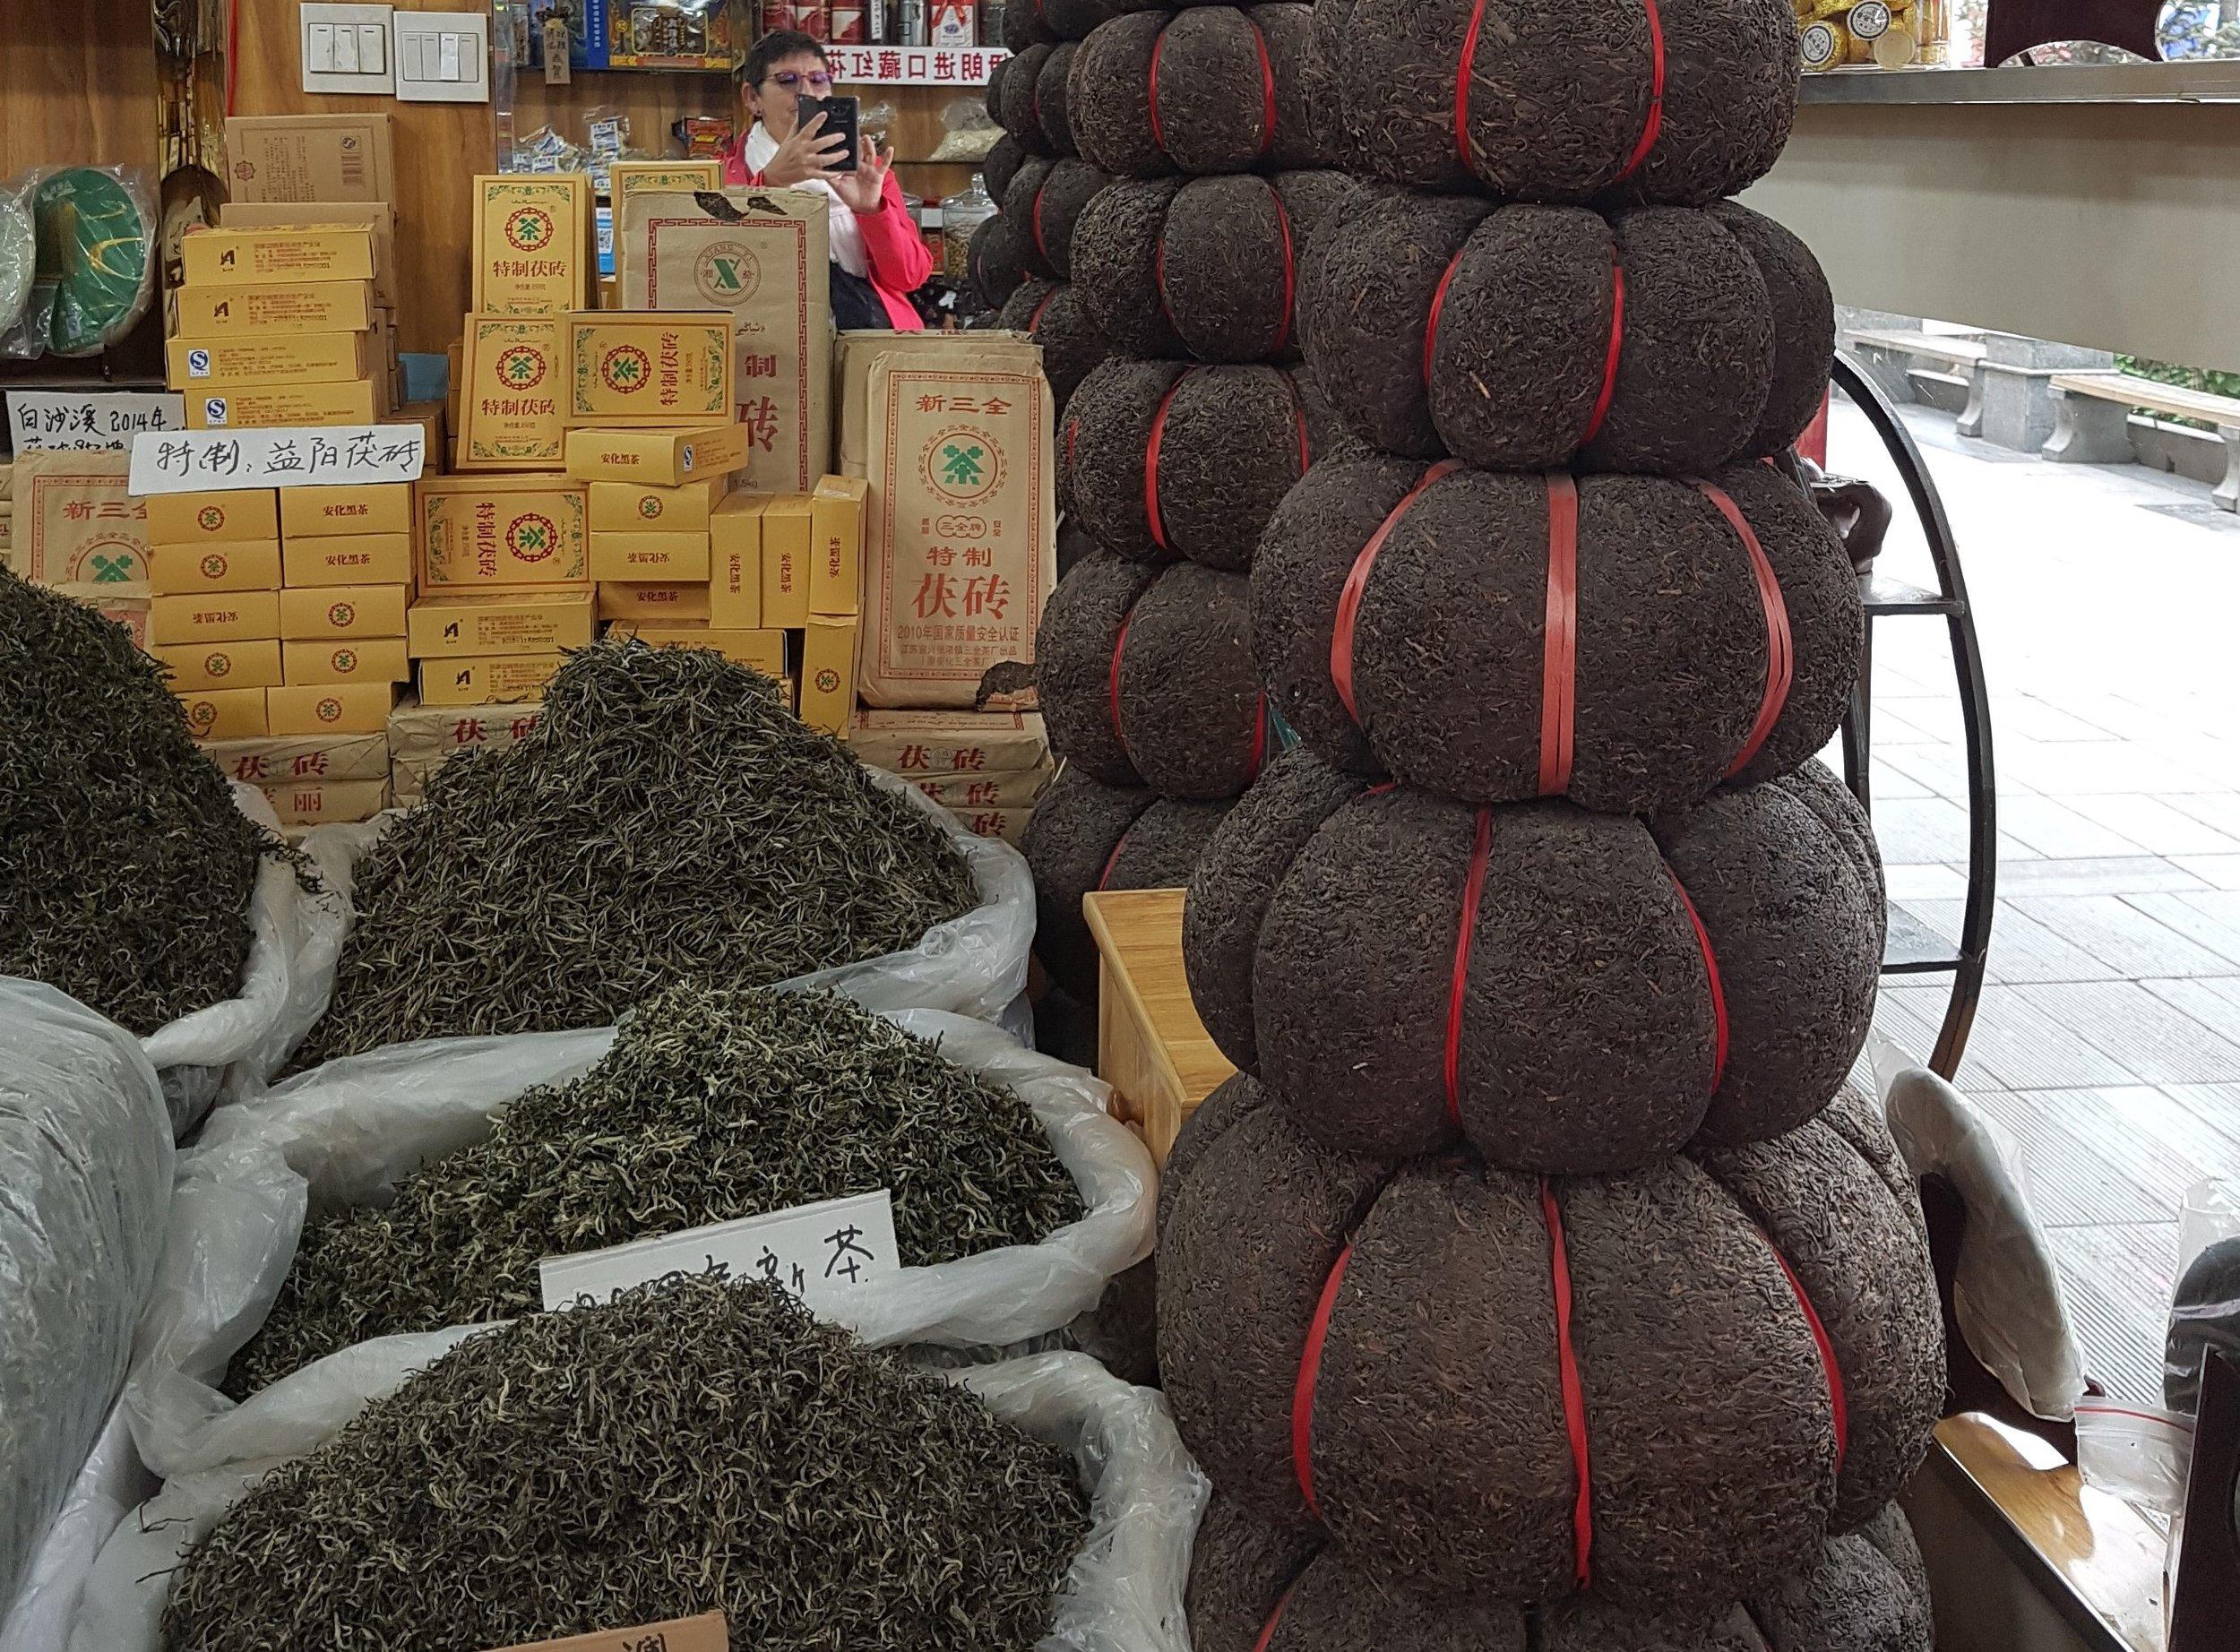 Tea shop in Xining